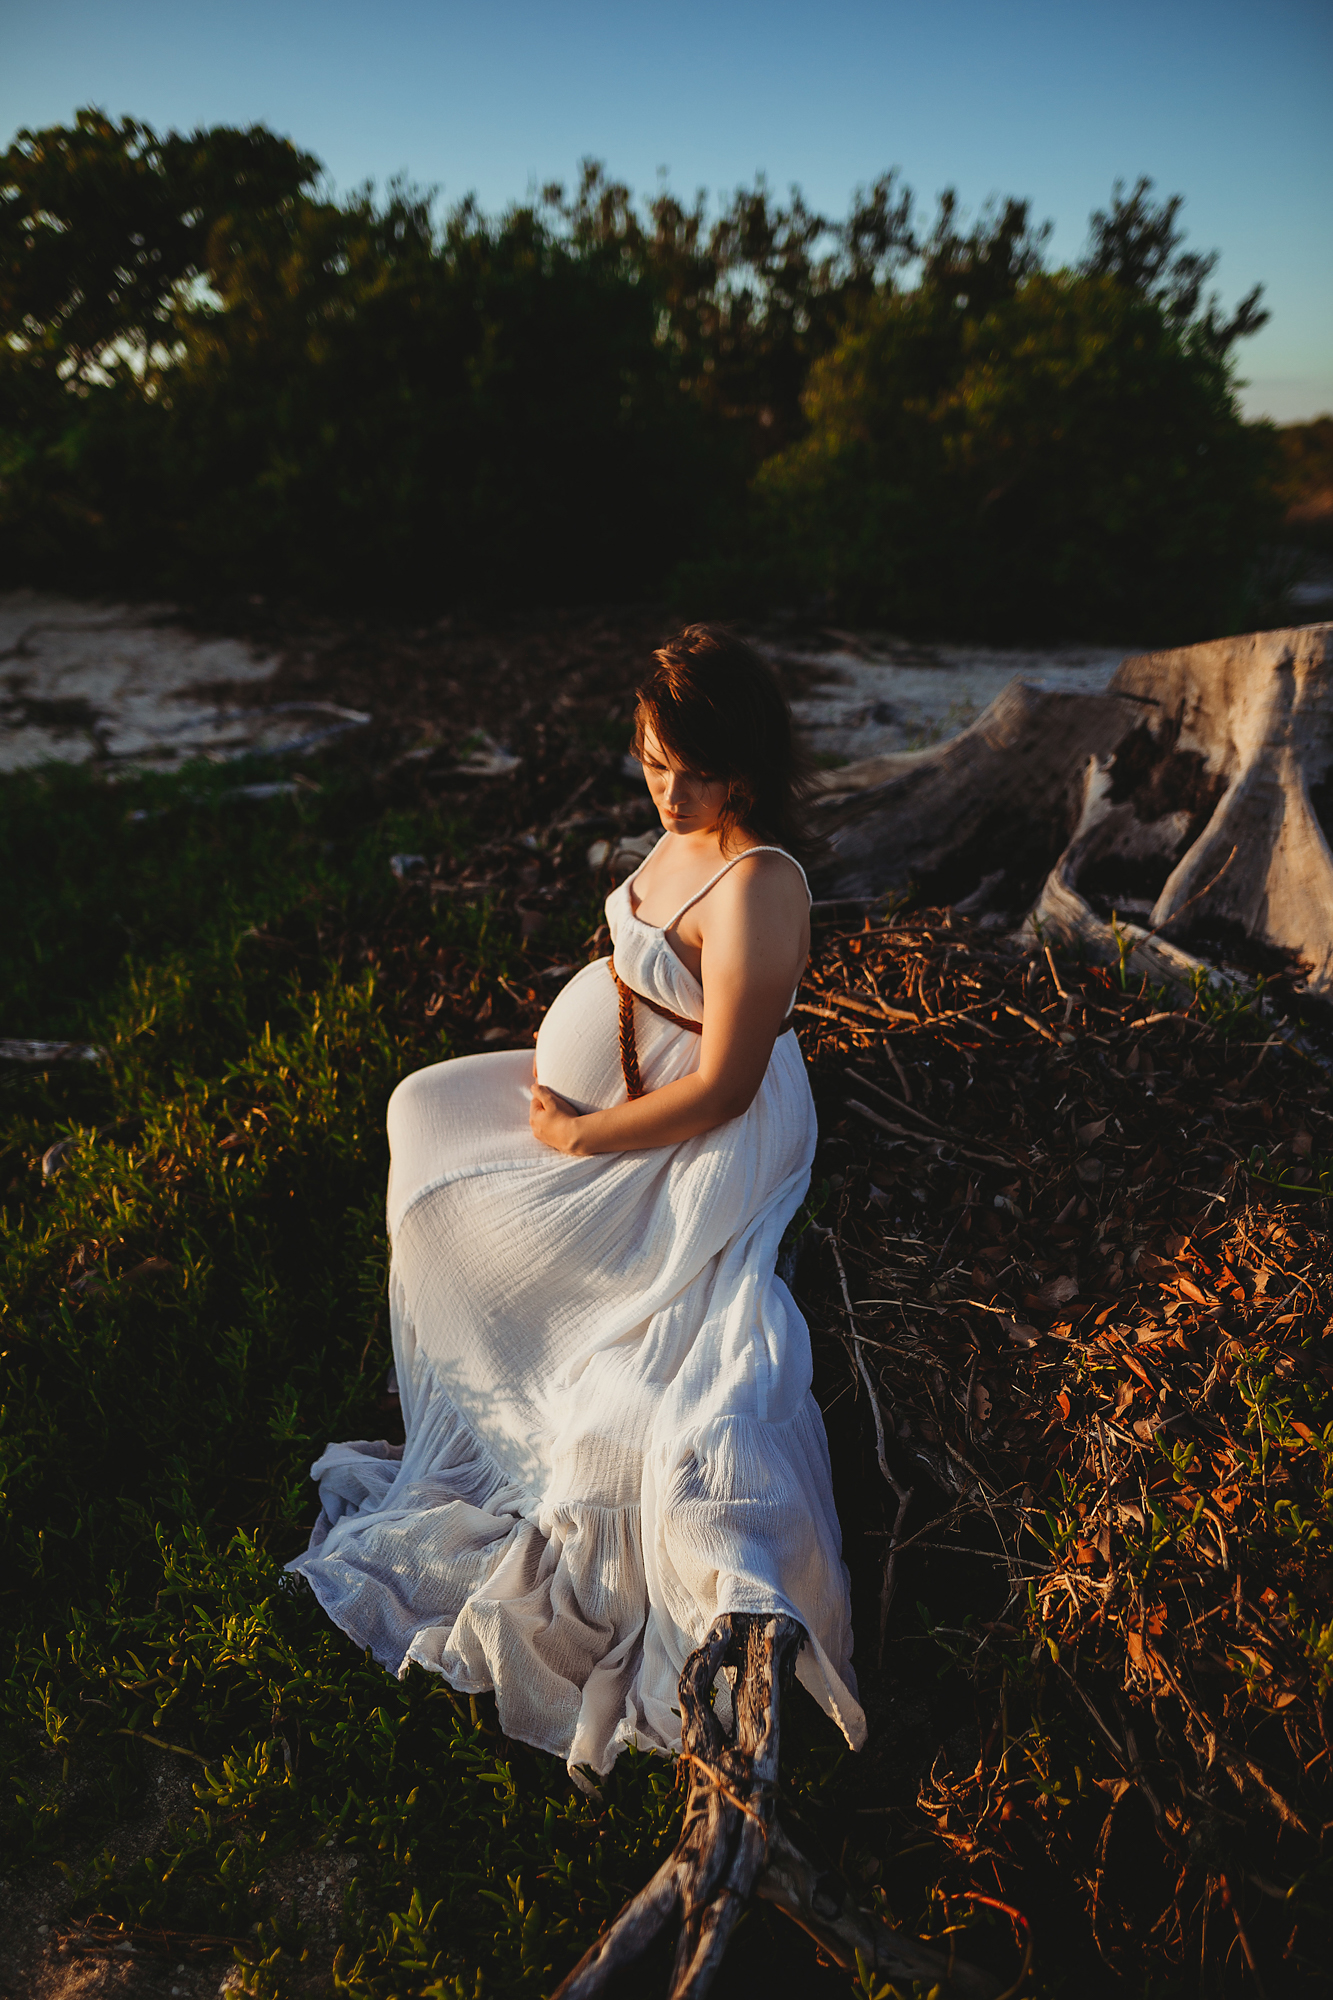 maternity shoot near me, pinellas county fl